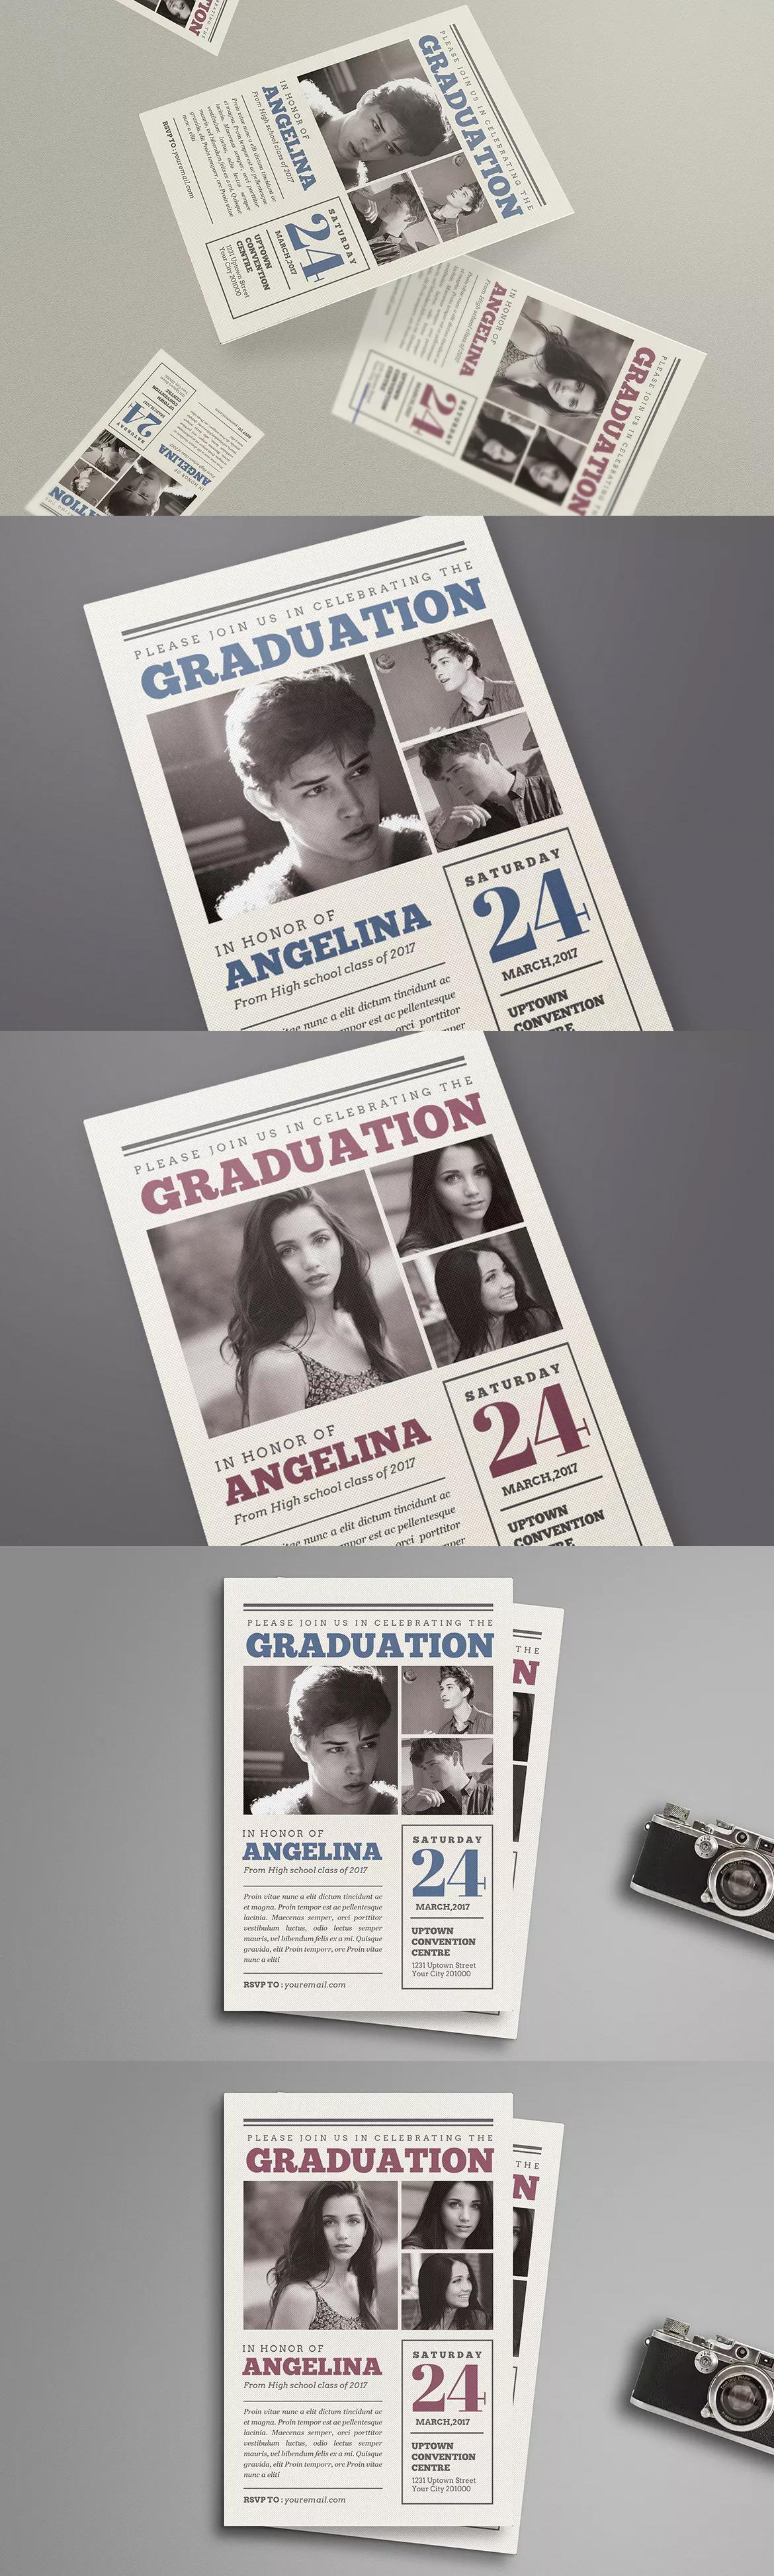 Newspaper Style Graduation Invitation Template PSD   Invitation Card ...